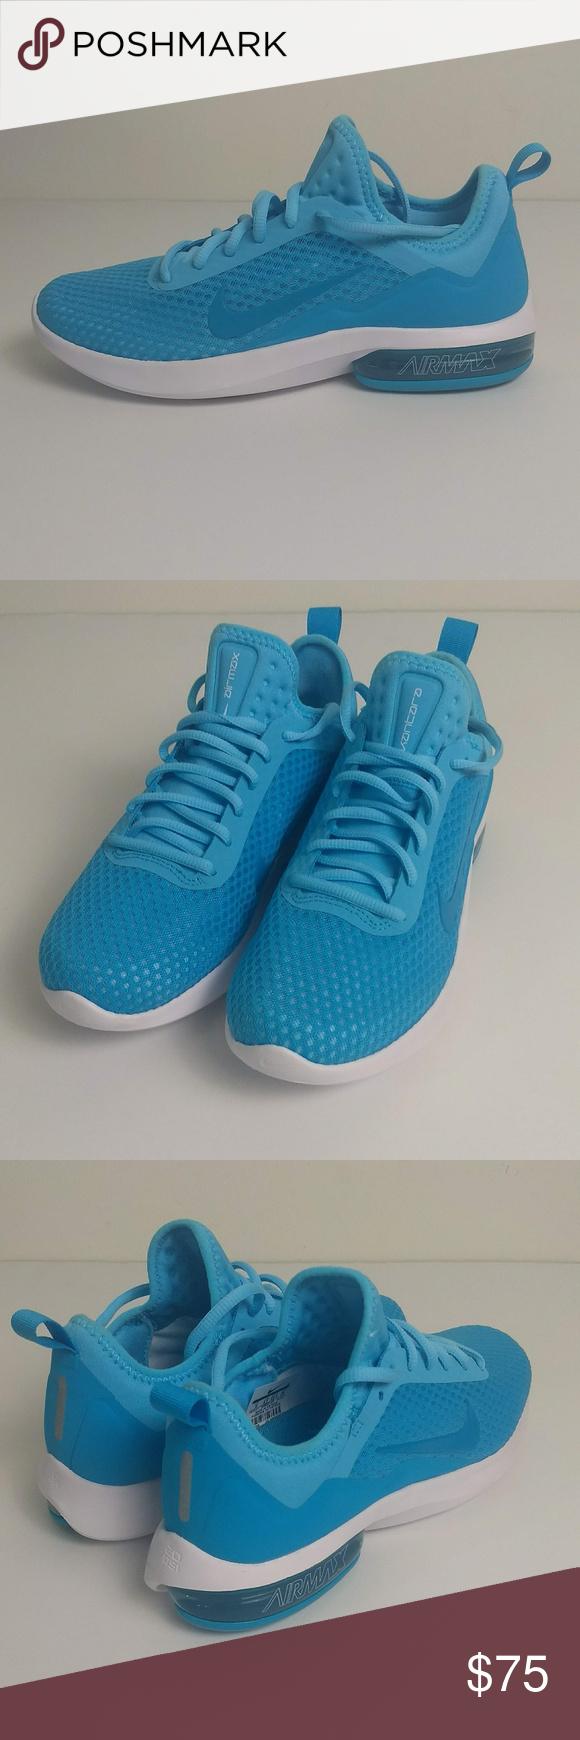 f28decd9d606b4 Nike Womens Air Max Kantara Running Shoes 9 Nike Womens Air Max Kantara  Running Shoes Lagoon